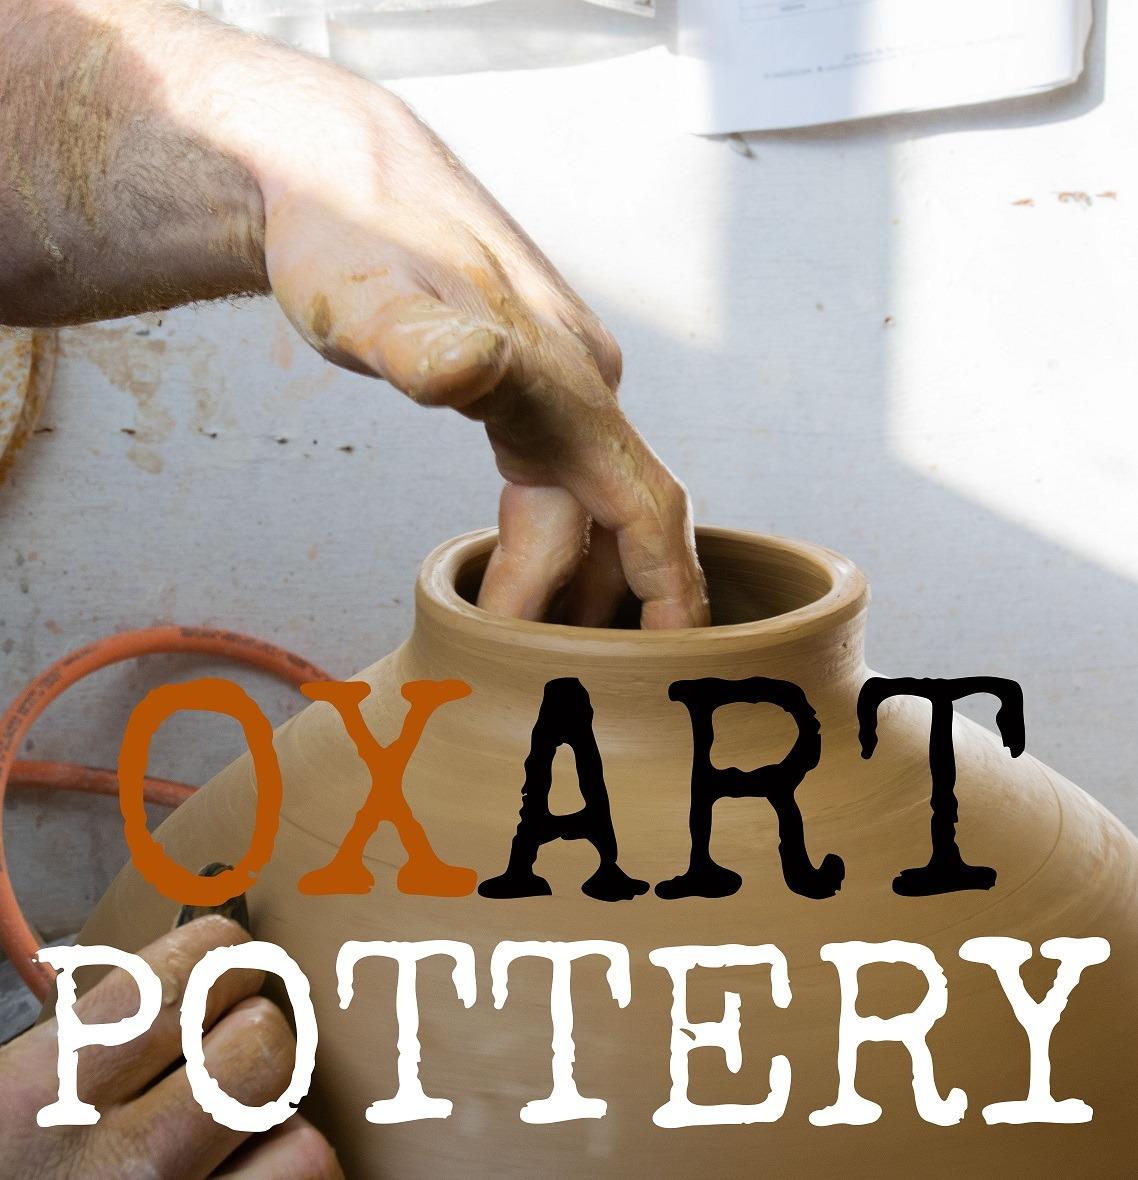 OXART pottery